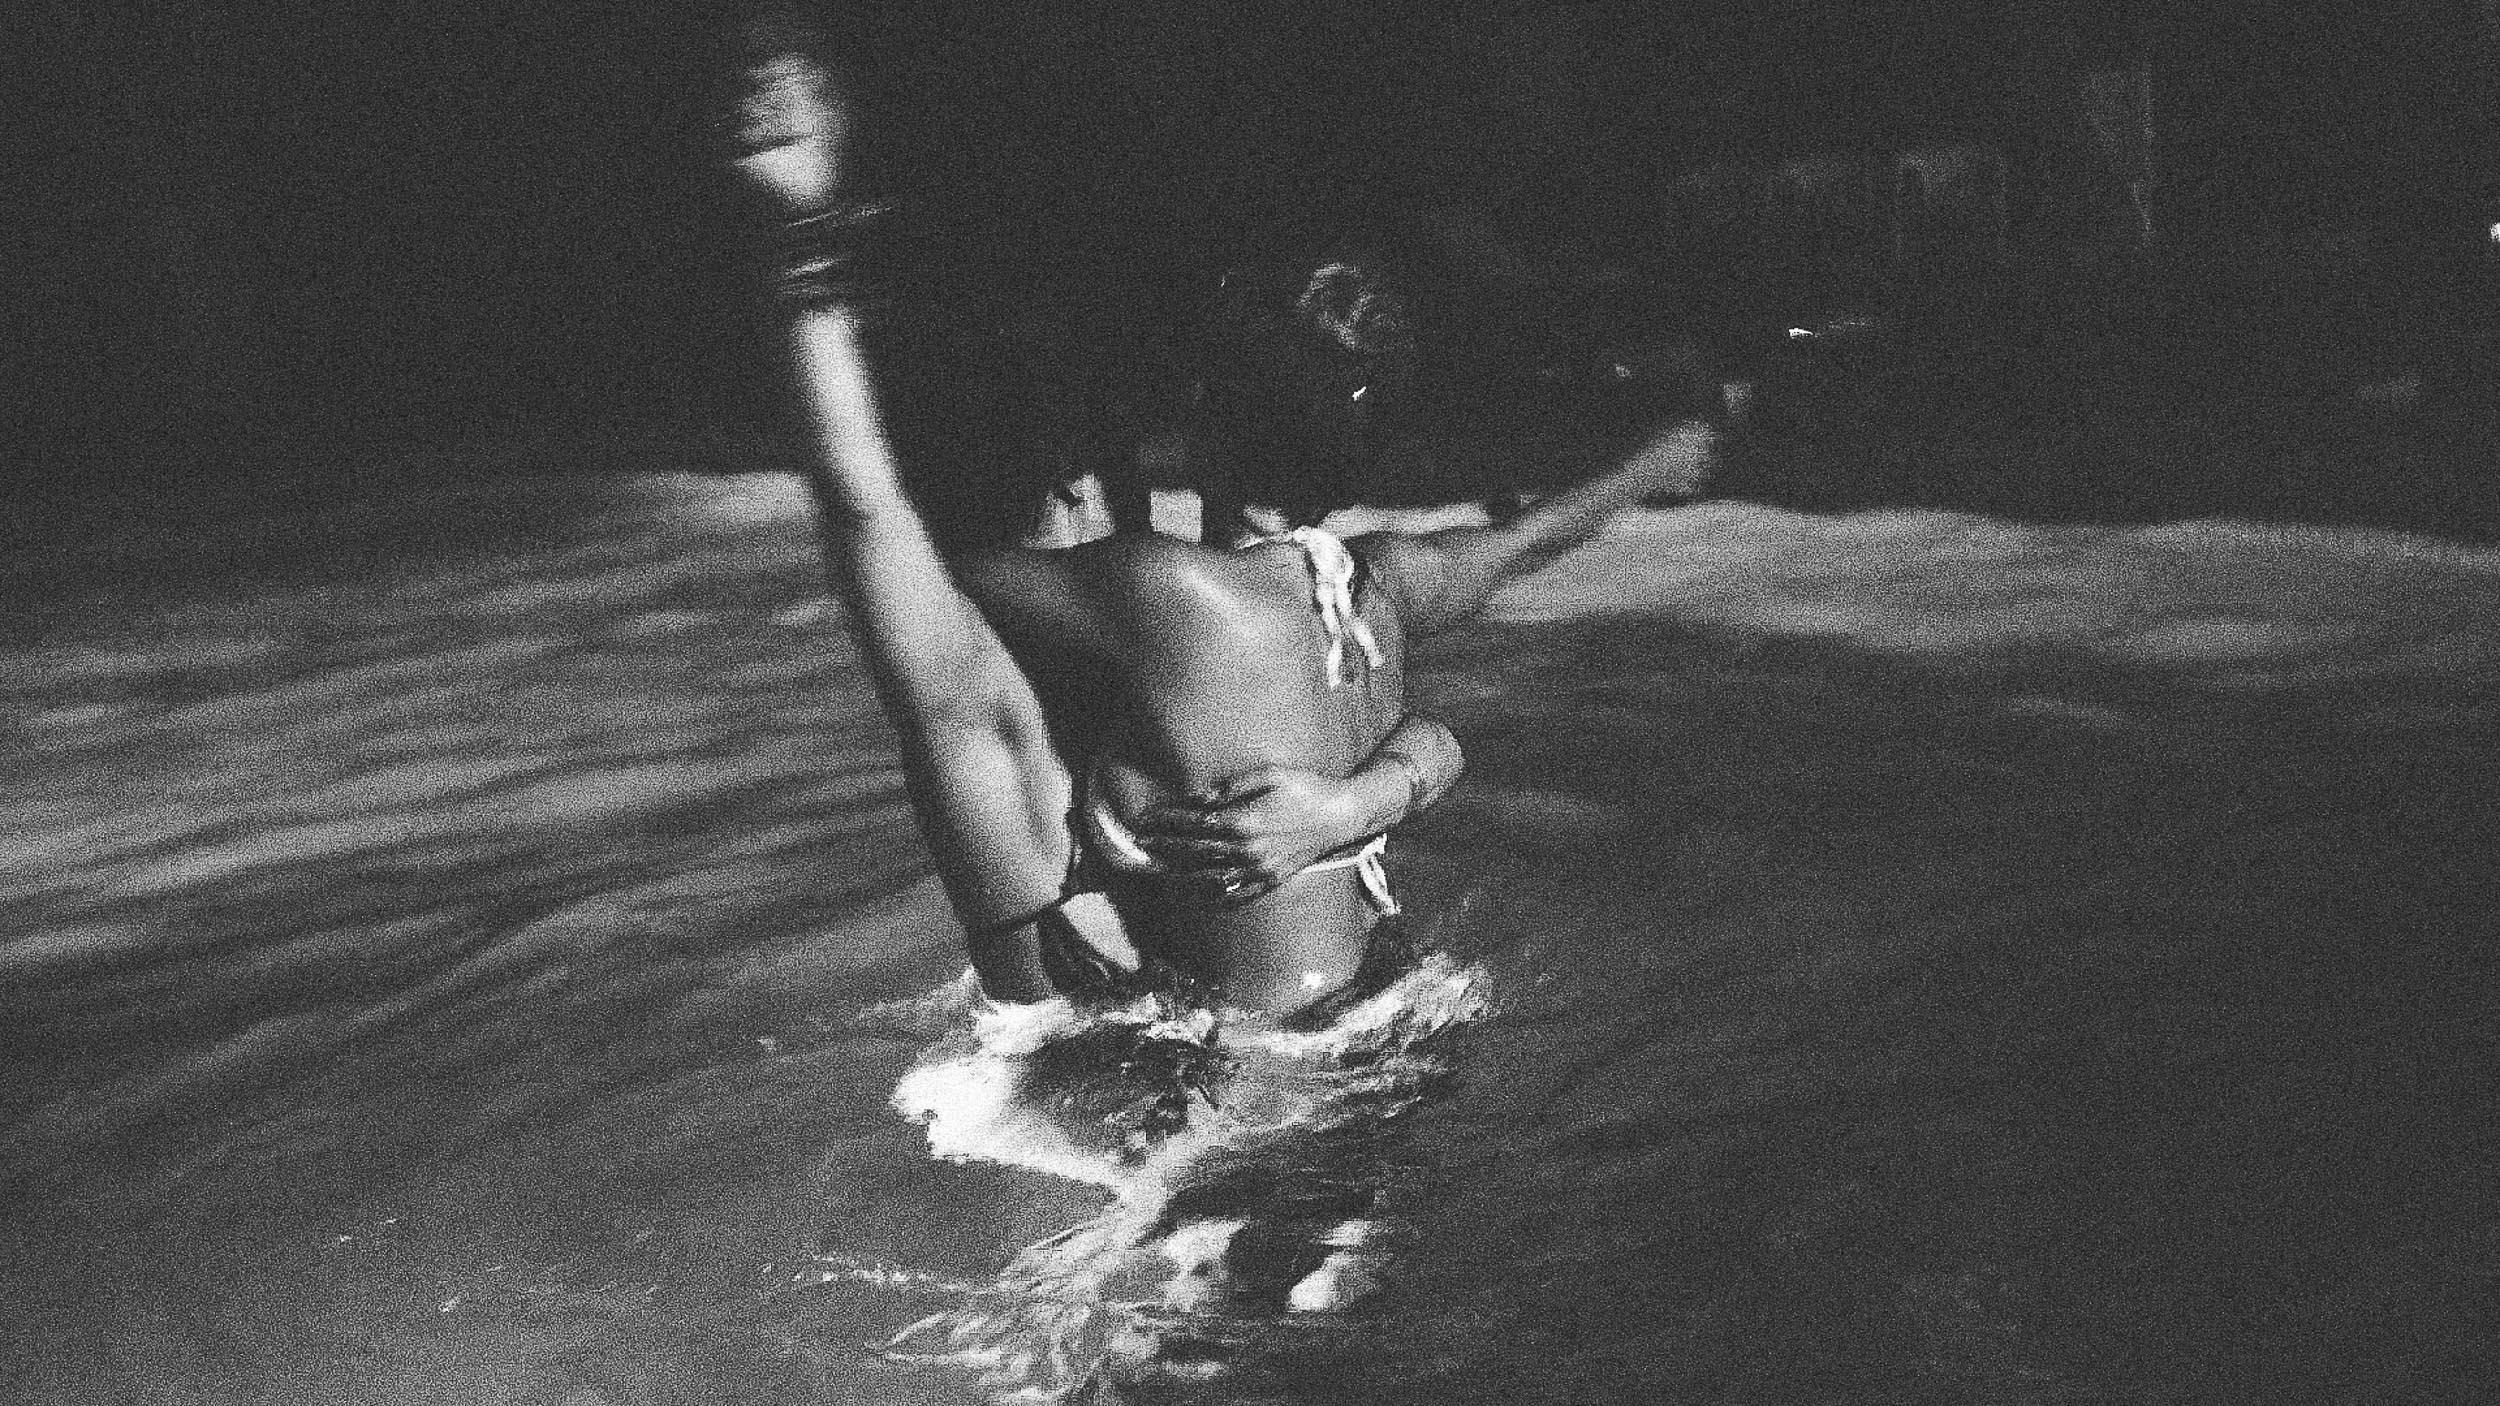 film-archive-kc.locke-74.jpg